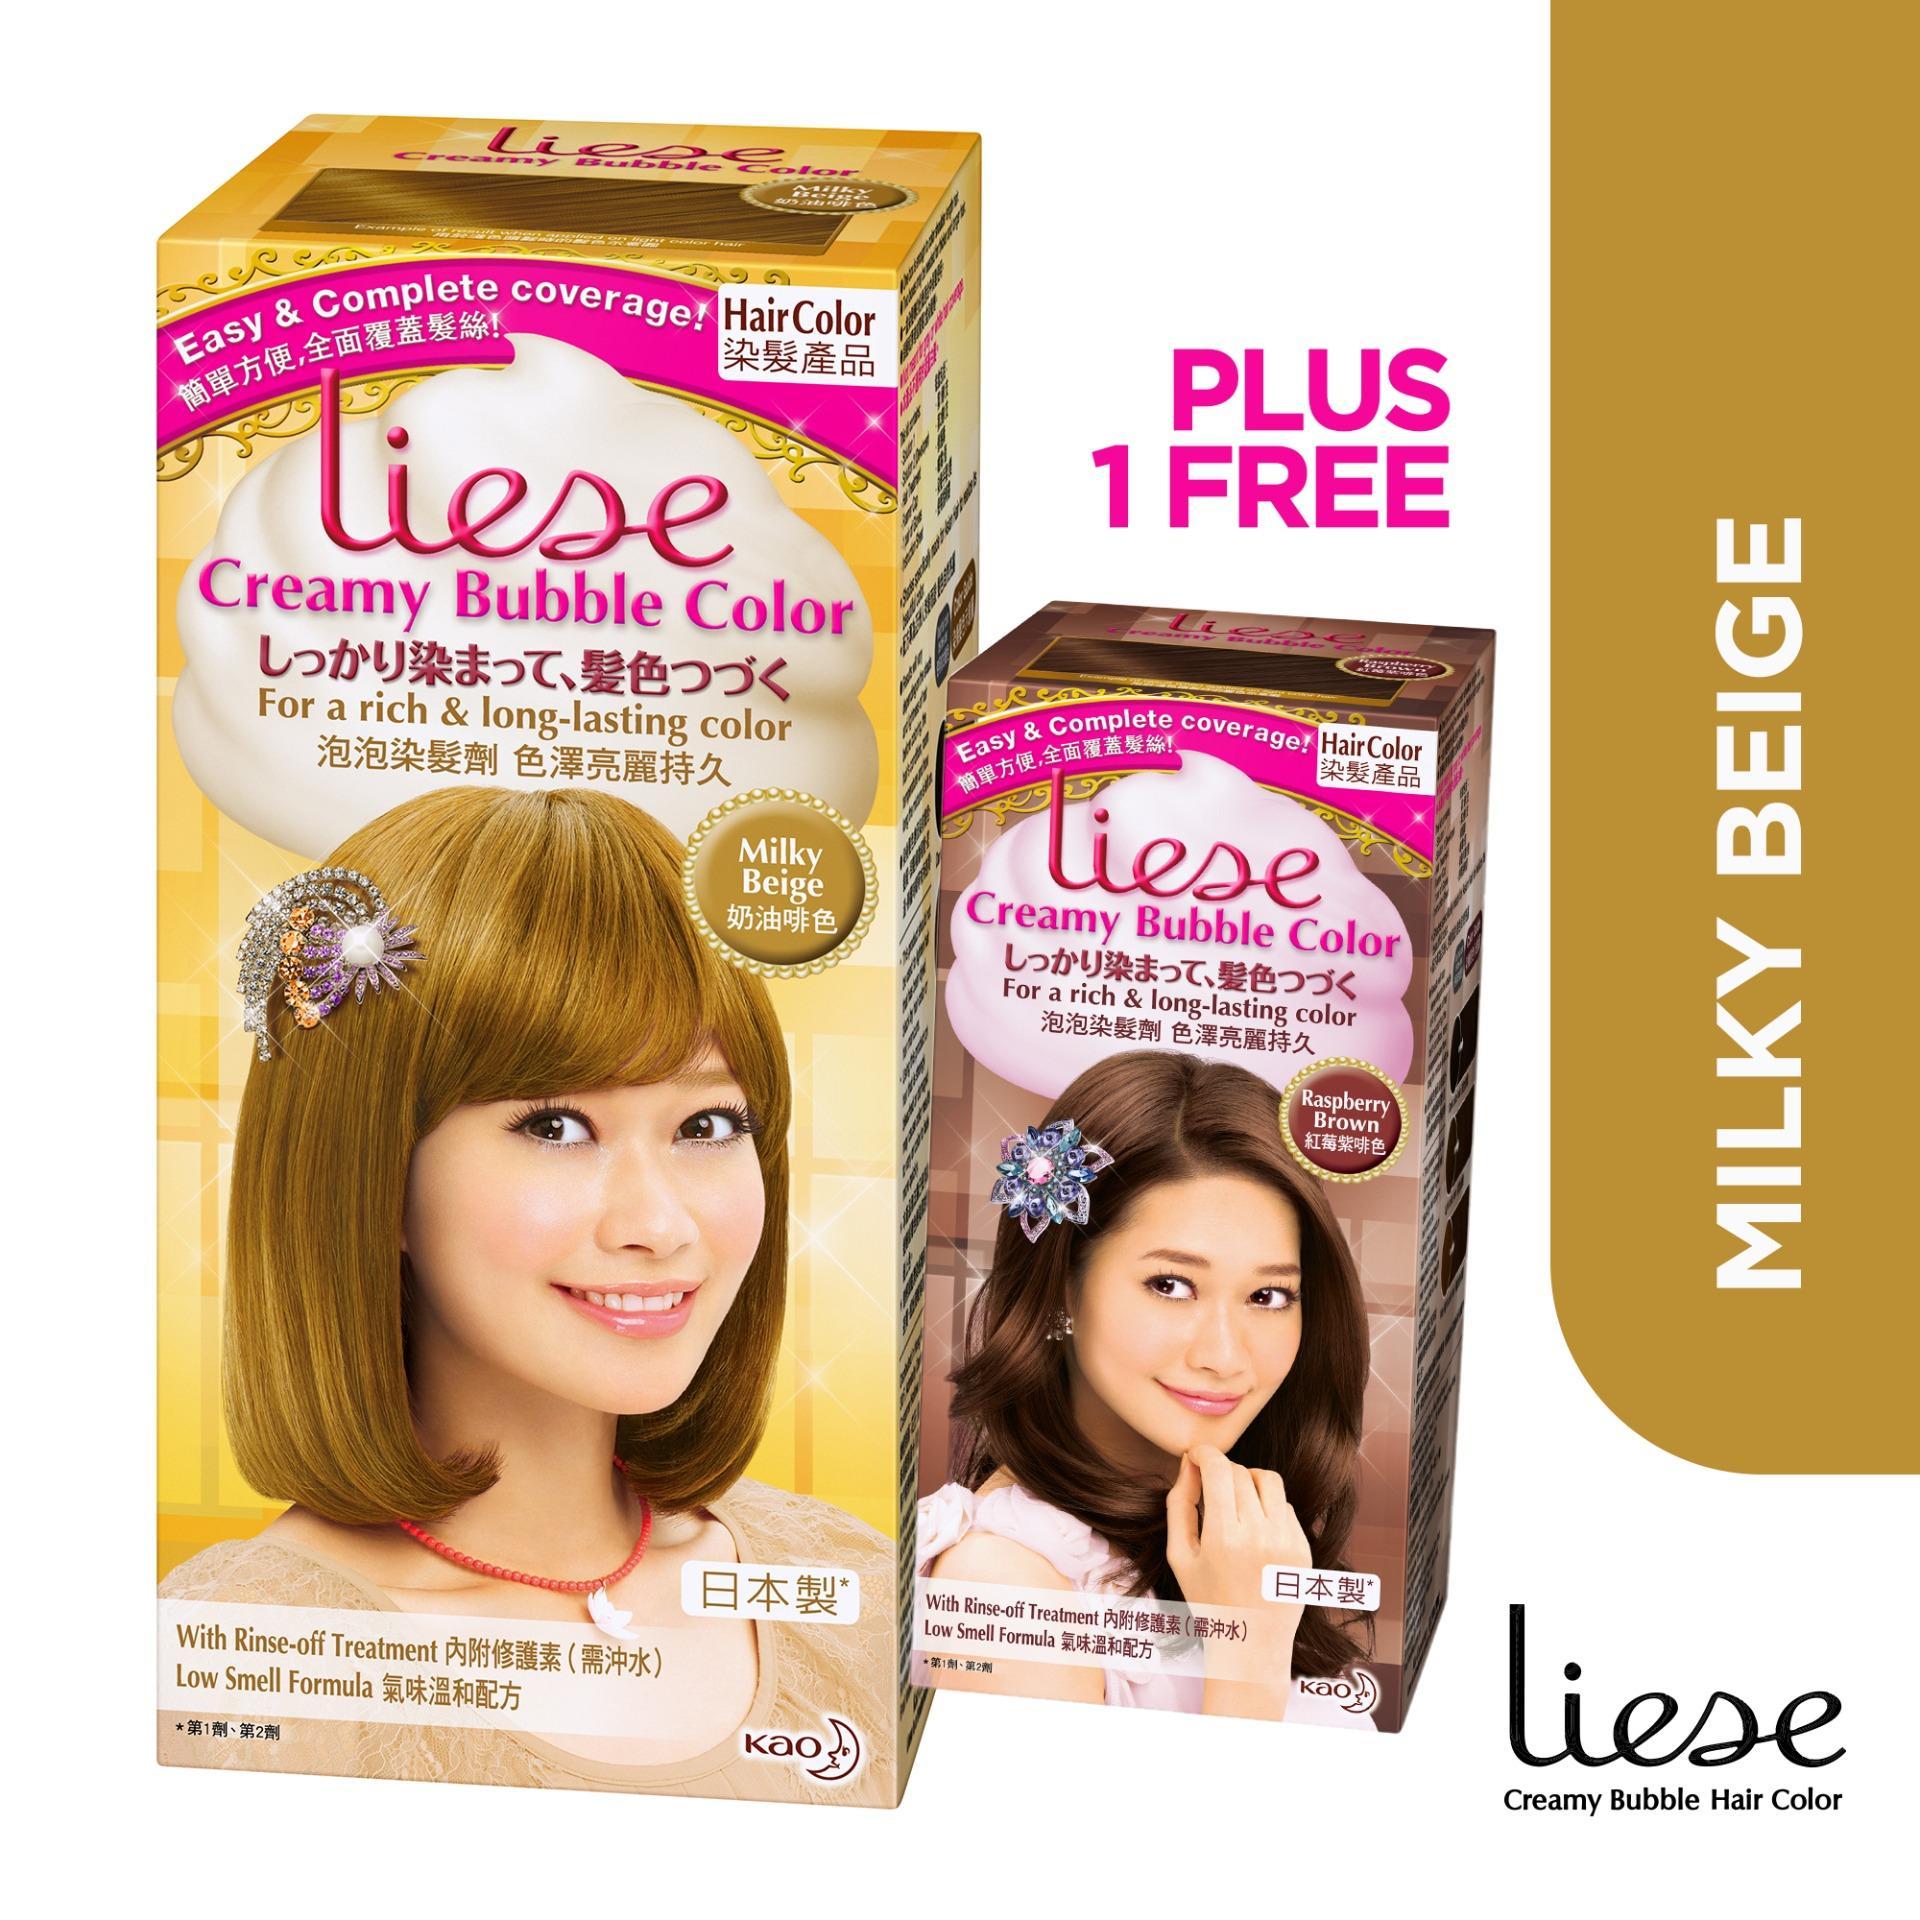 Discount Palty Bubble Hair Color Cinnamon Churros Buy 1 Take 1